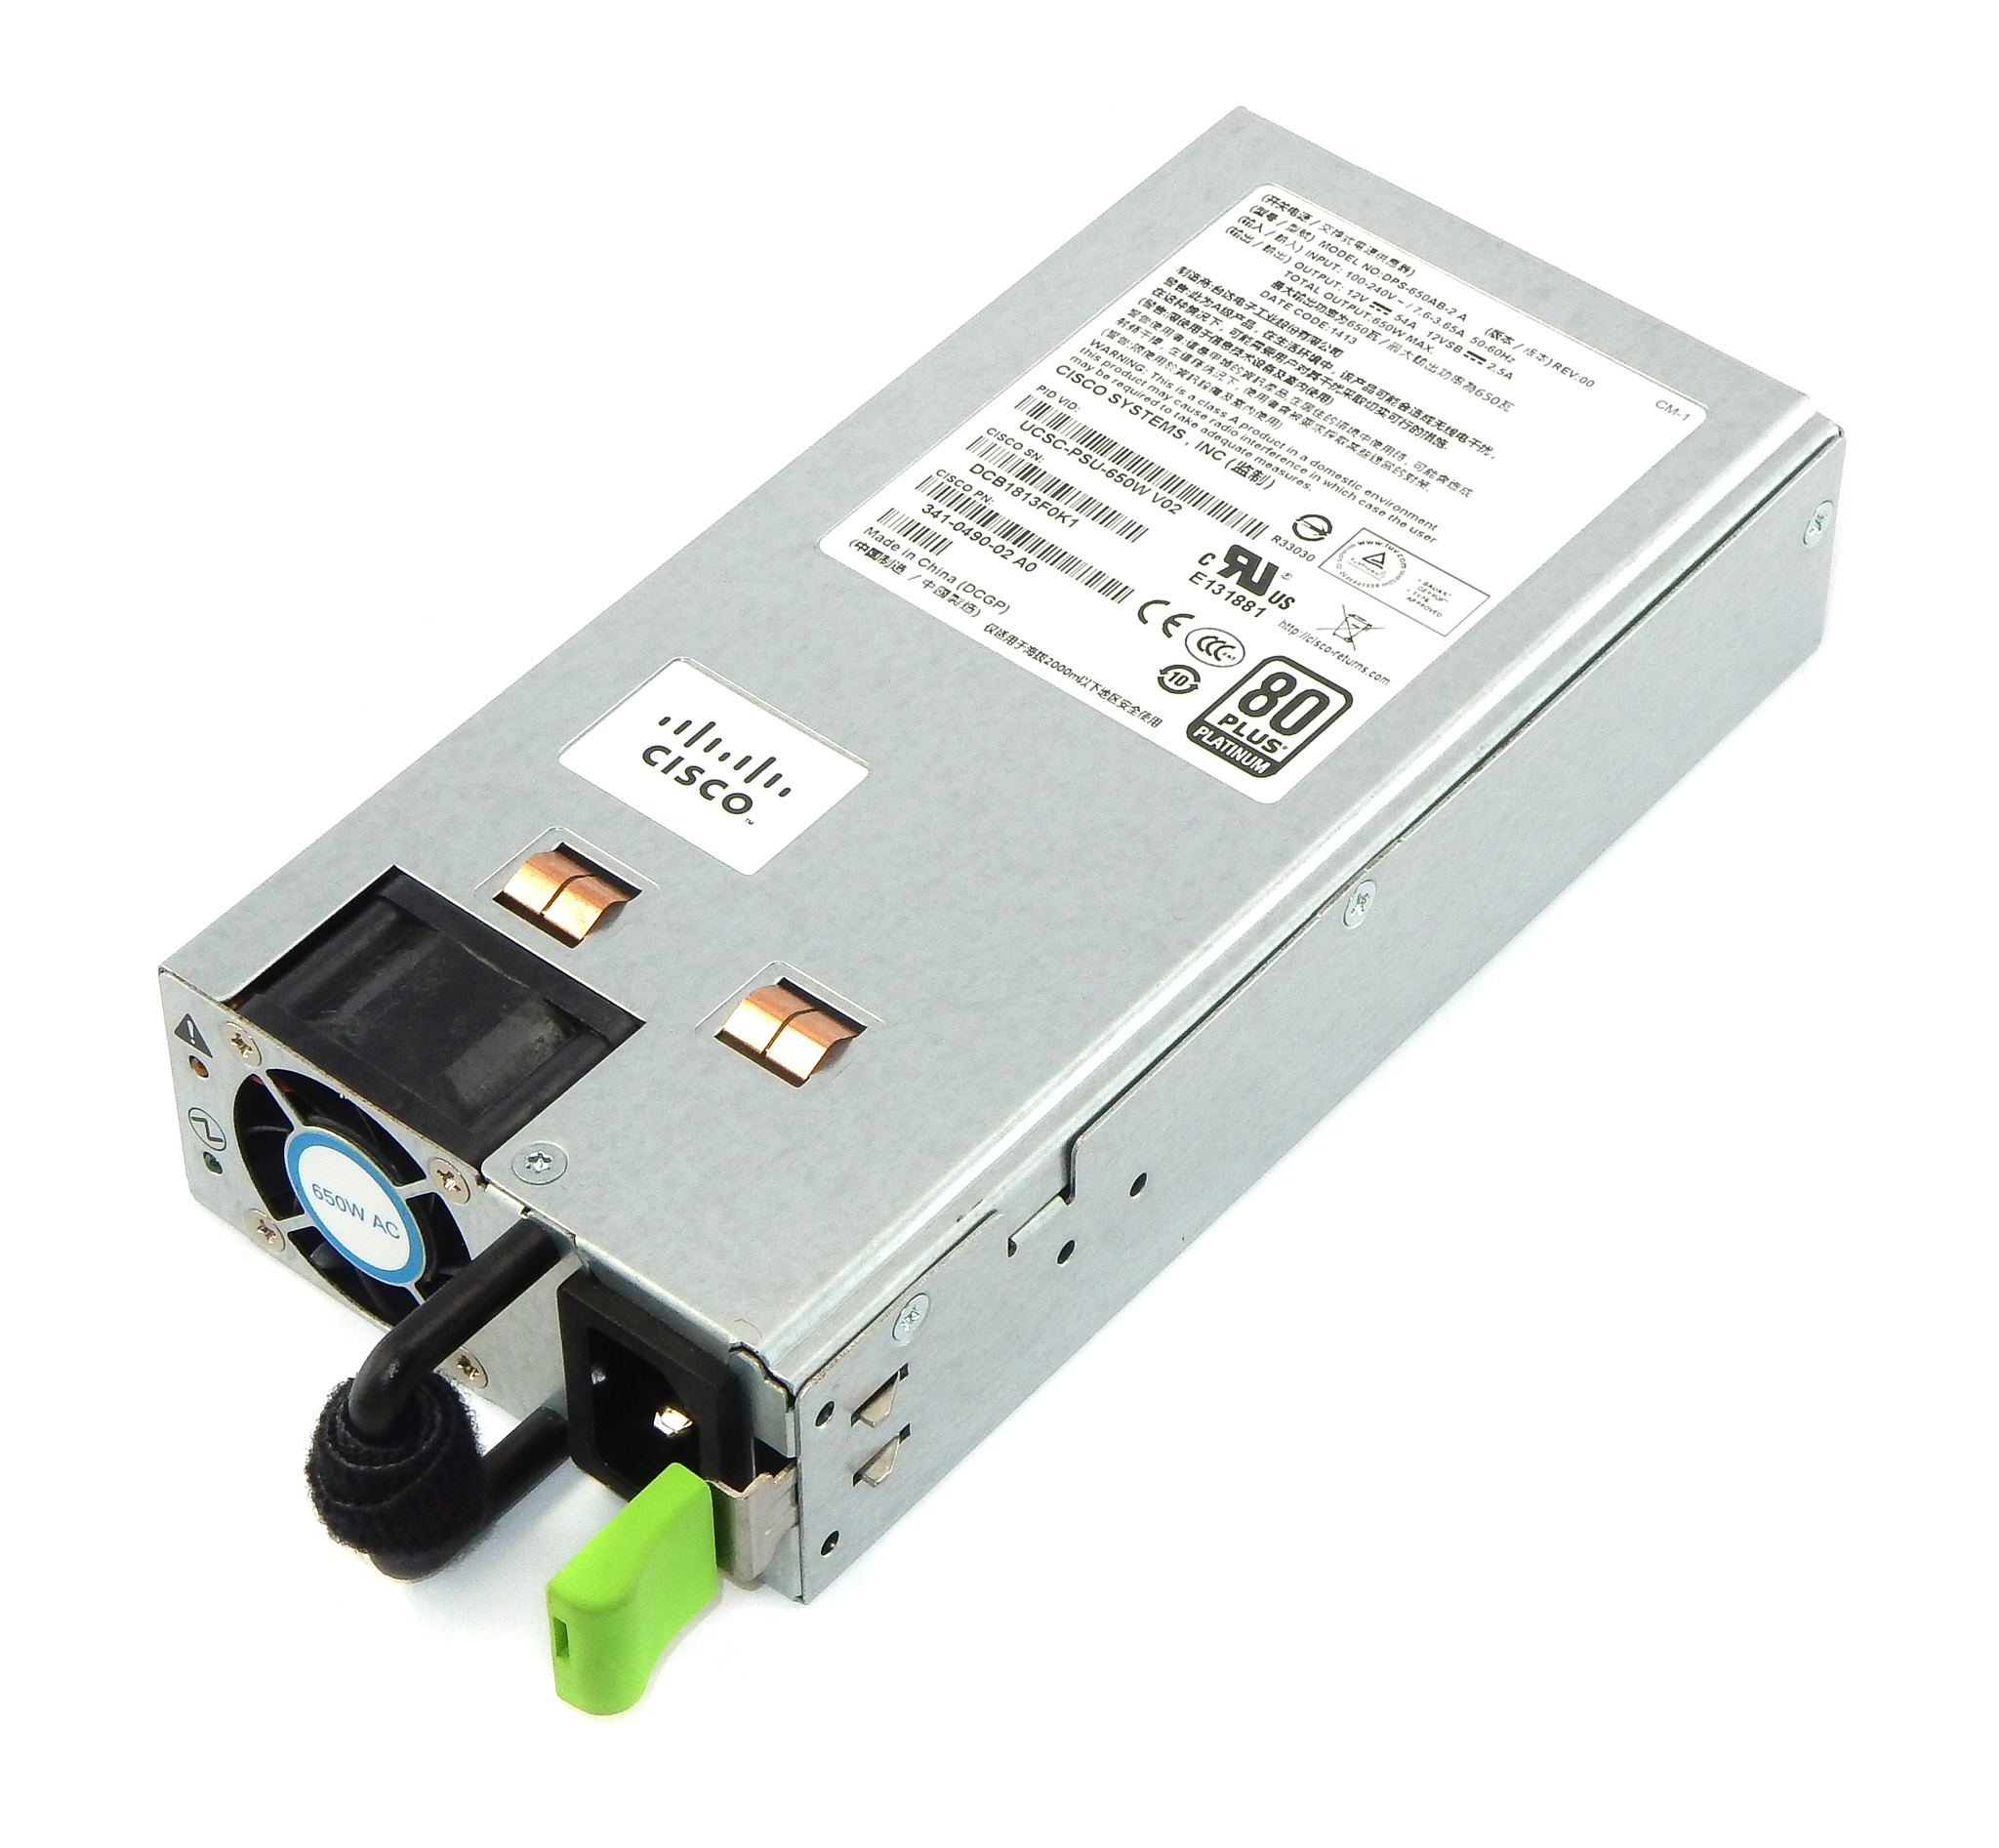 341-0490-02 Cisco 650W PSU Model: DPS-650AB-2 /f UCS C220 M3 Server